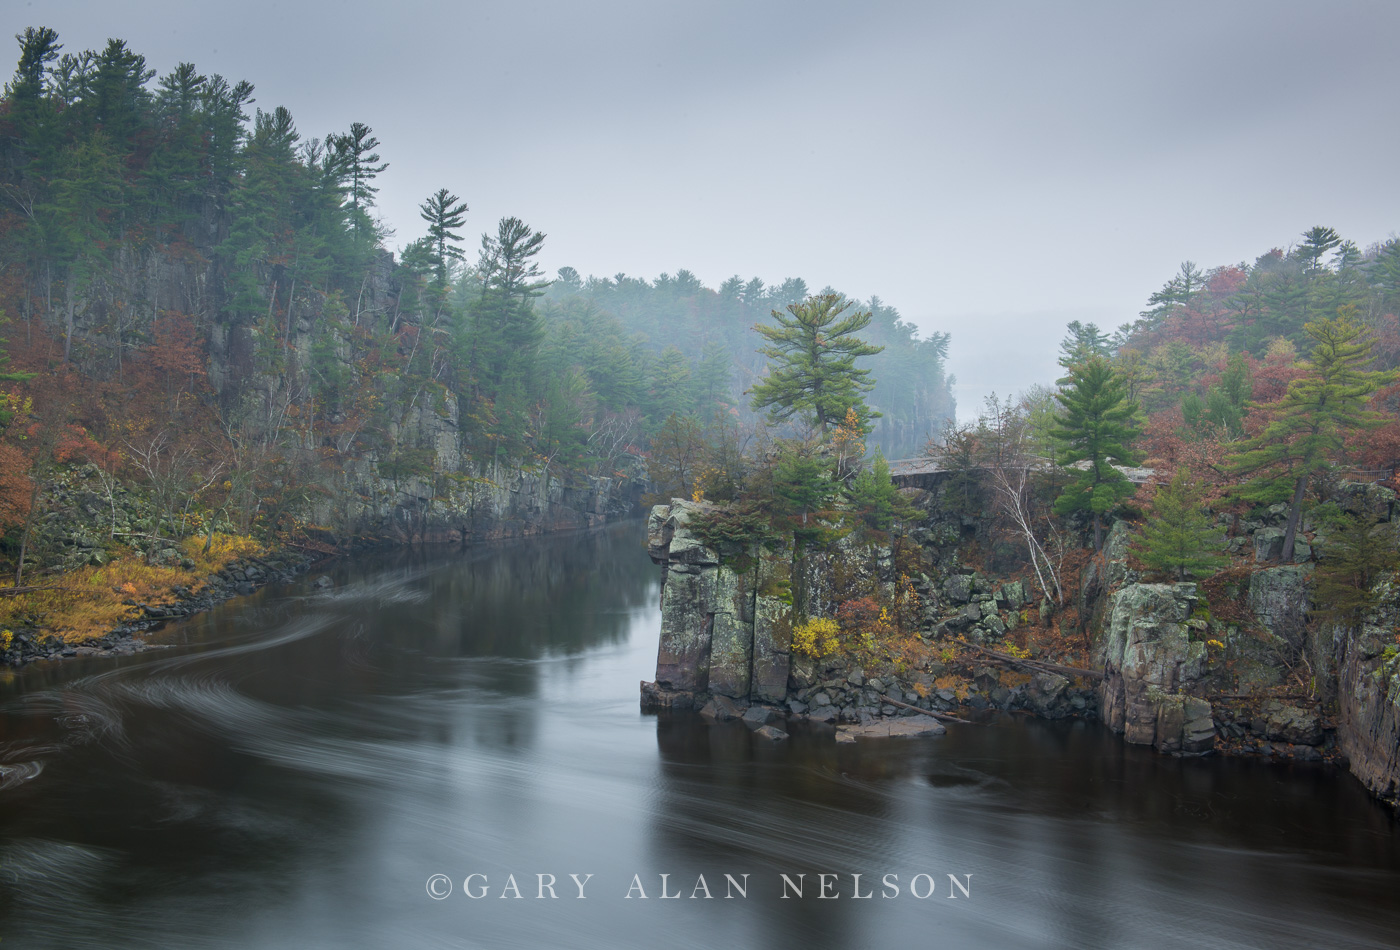 st. croix river, national scenic river,minnesota, wisconsin, photo